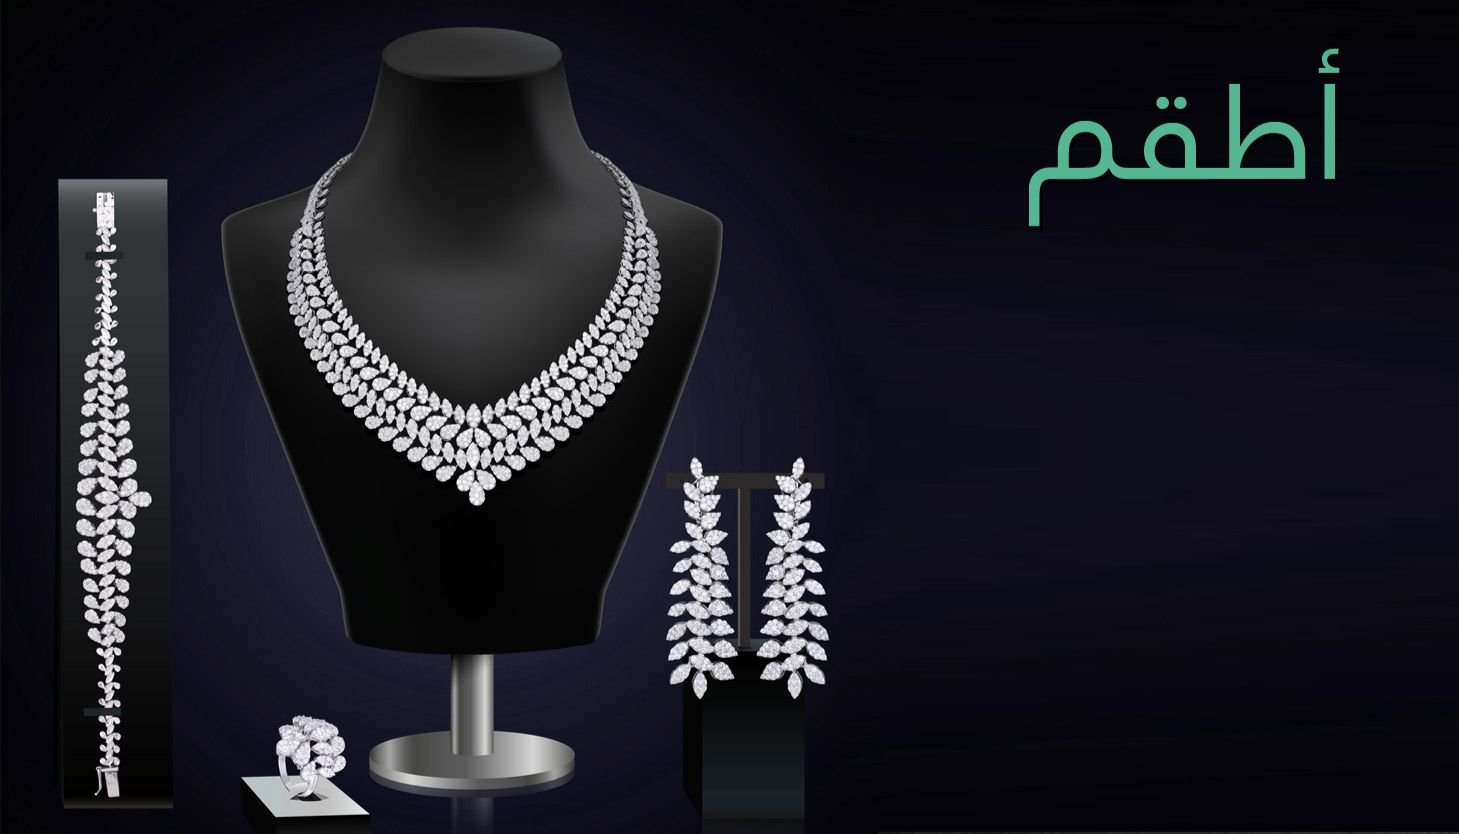 بيت الامراء للساعات والمجوهرات Diamond Necklace Statement Necklace Jewelry